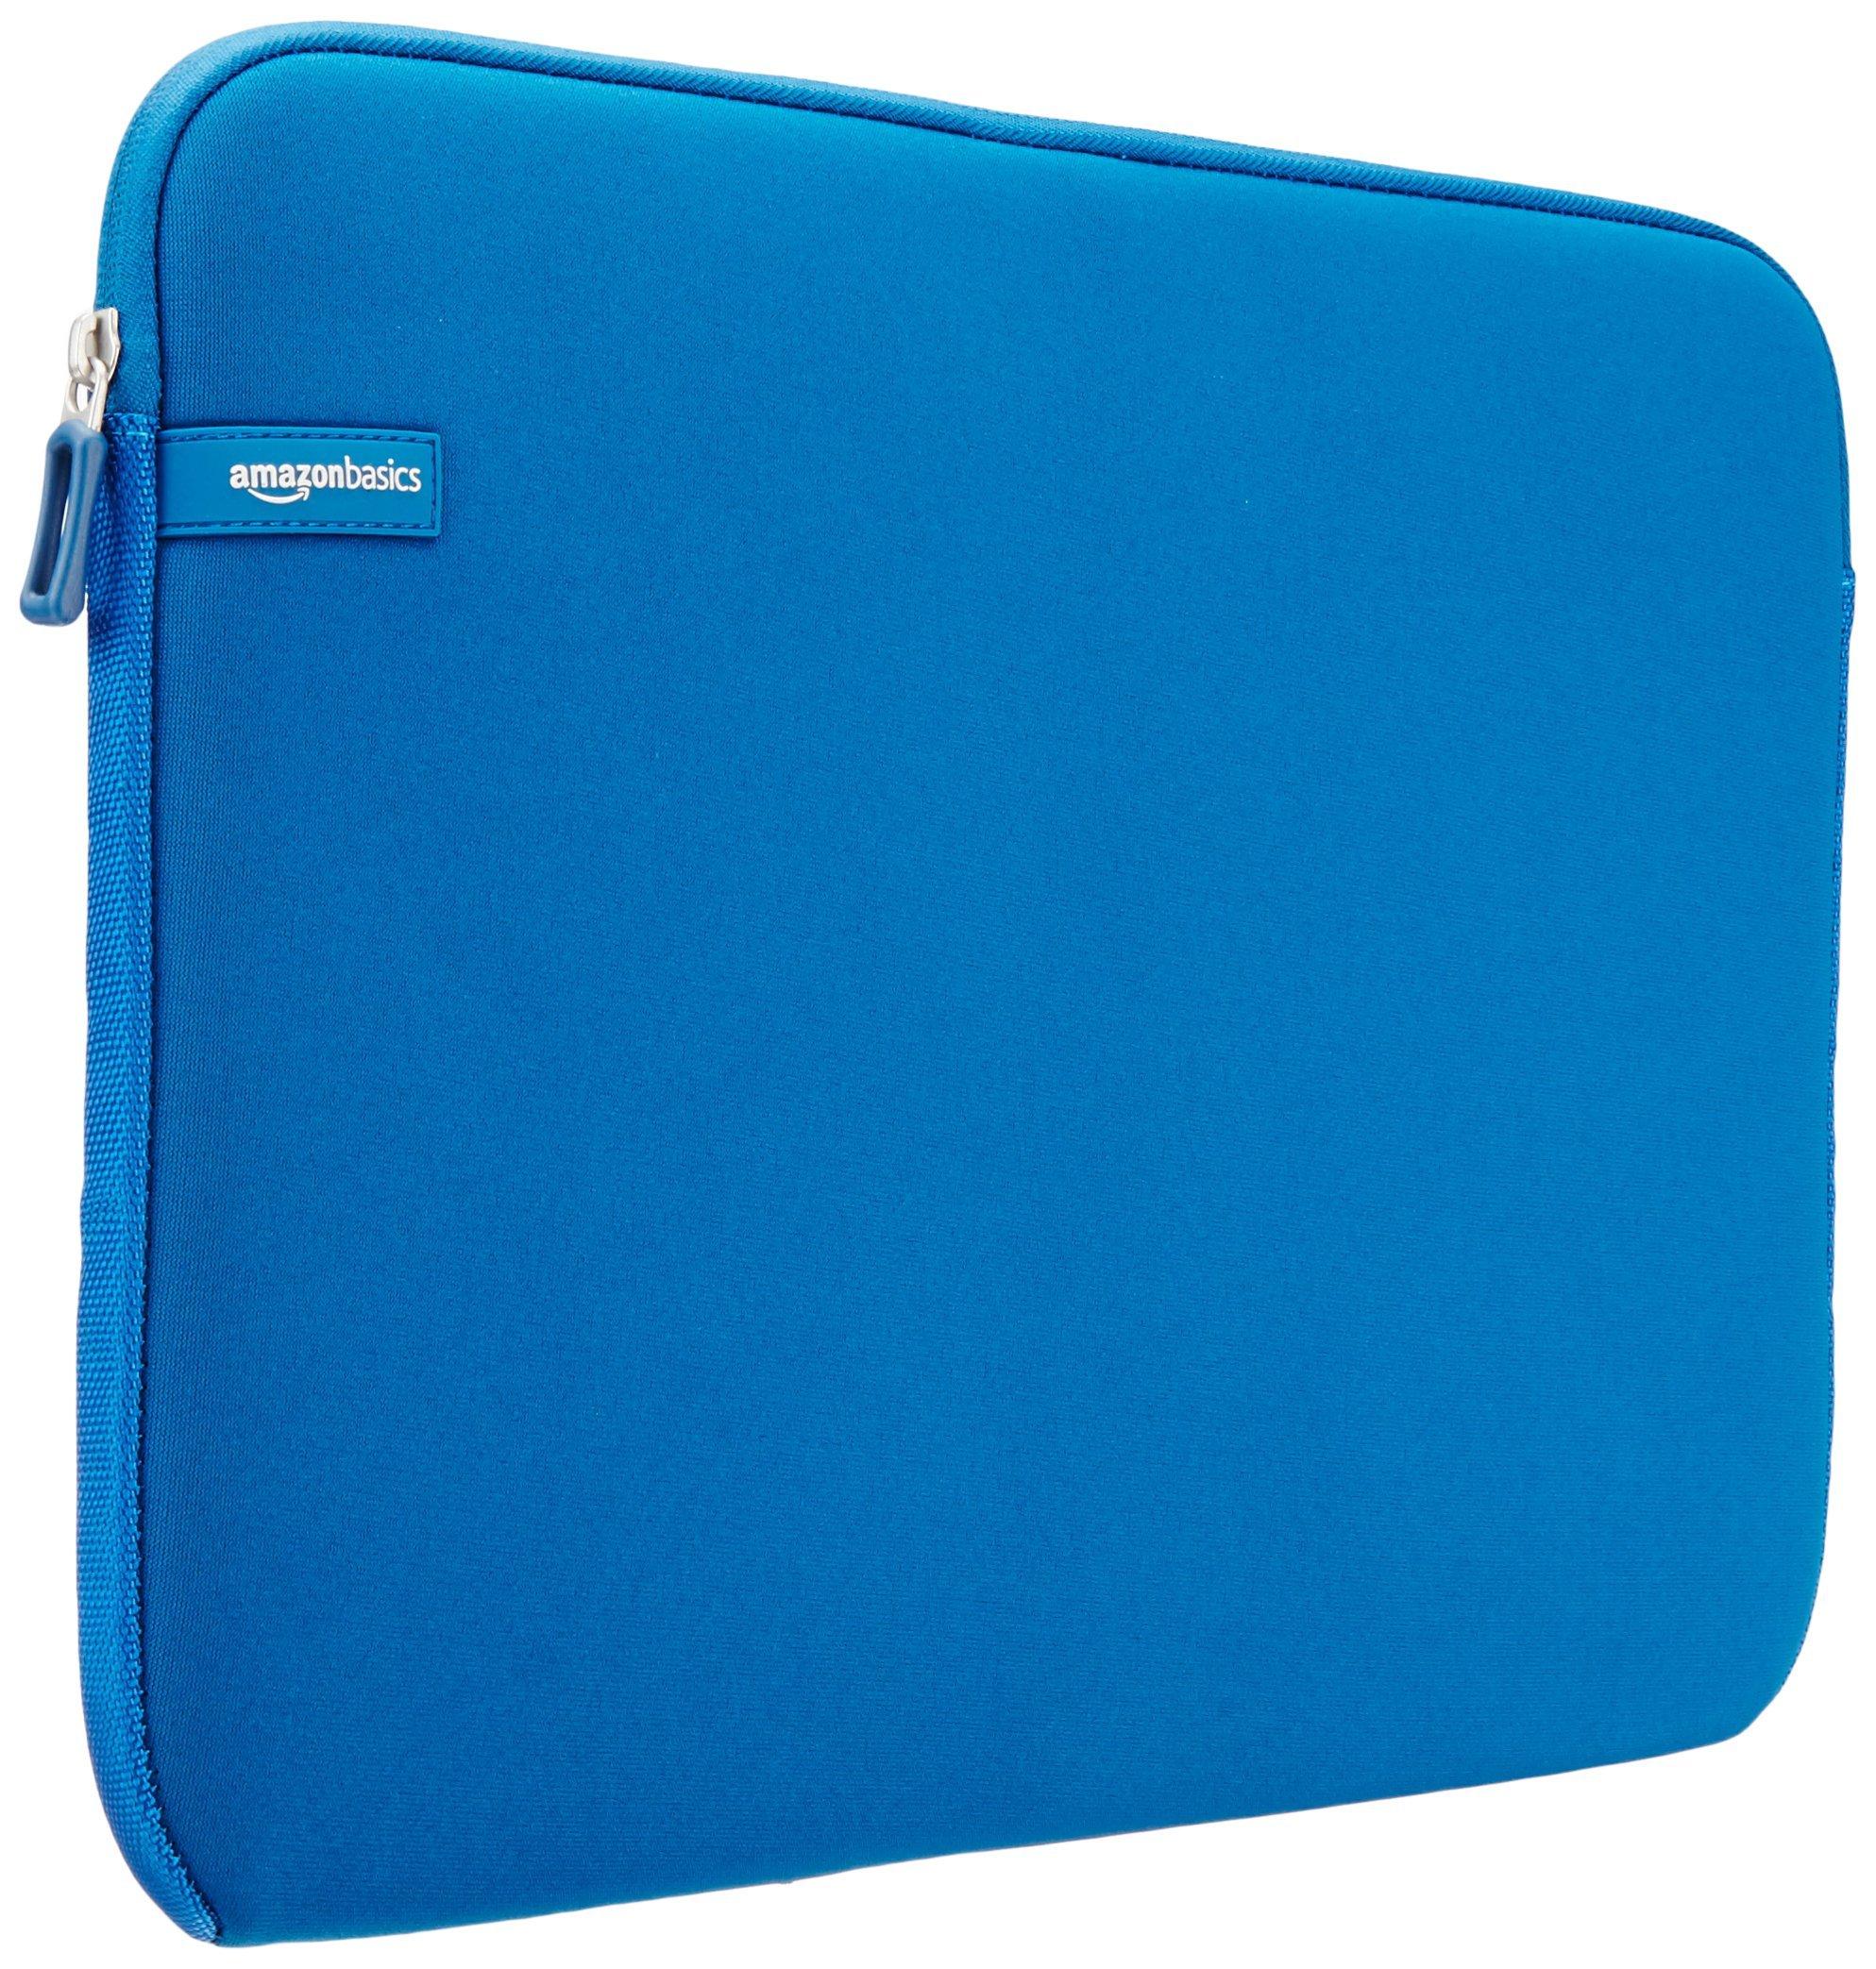 AmazonBasics 15.6 Inch Laptop Computer Sleeve Case